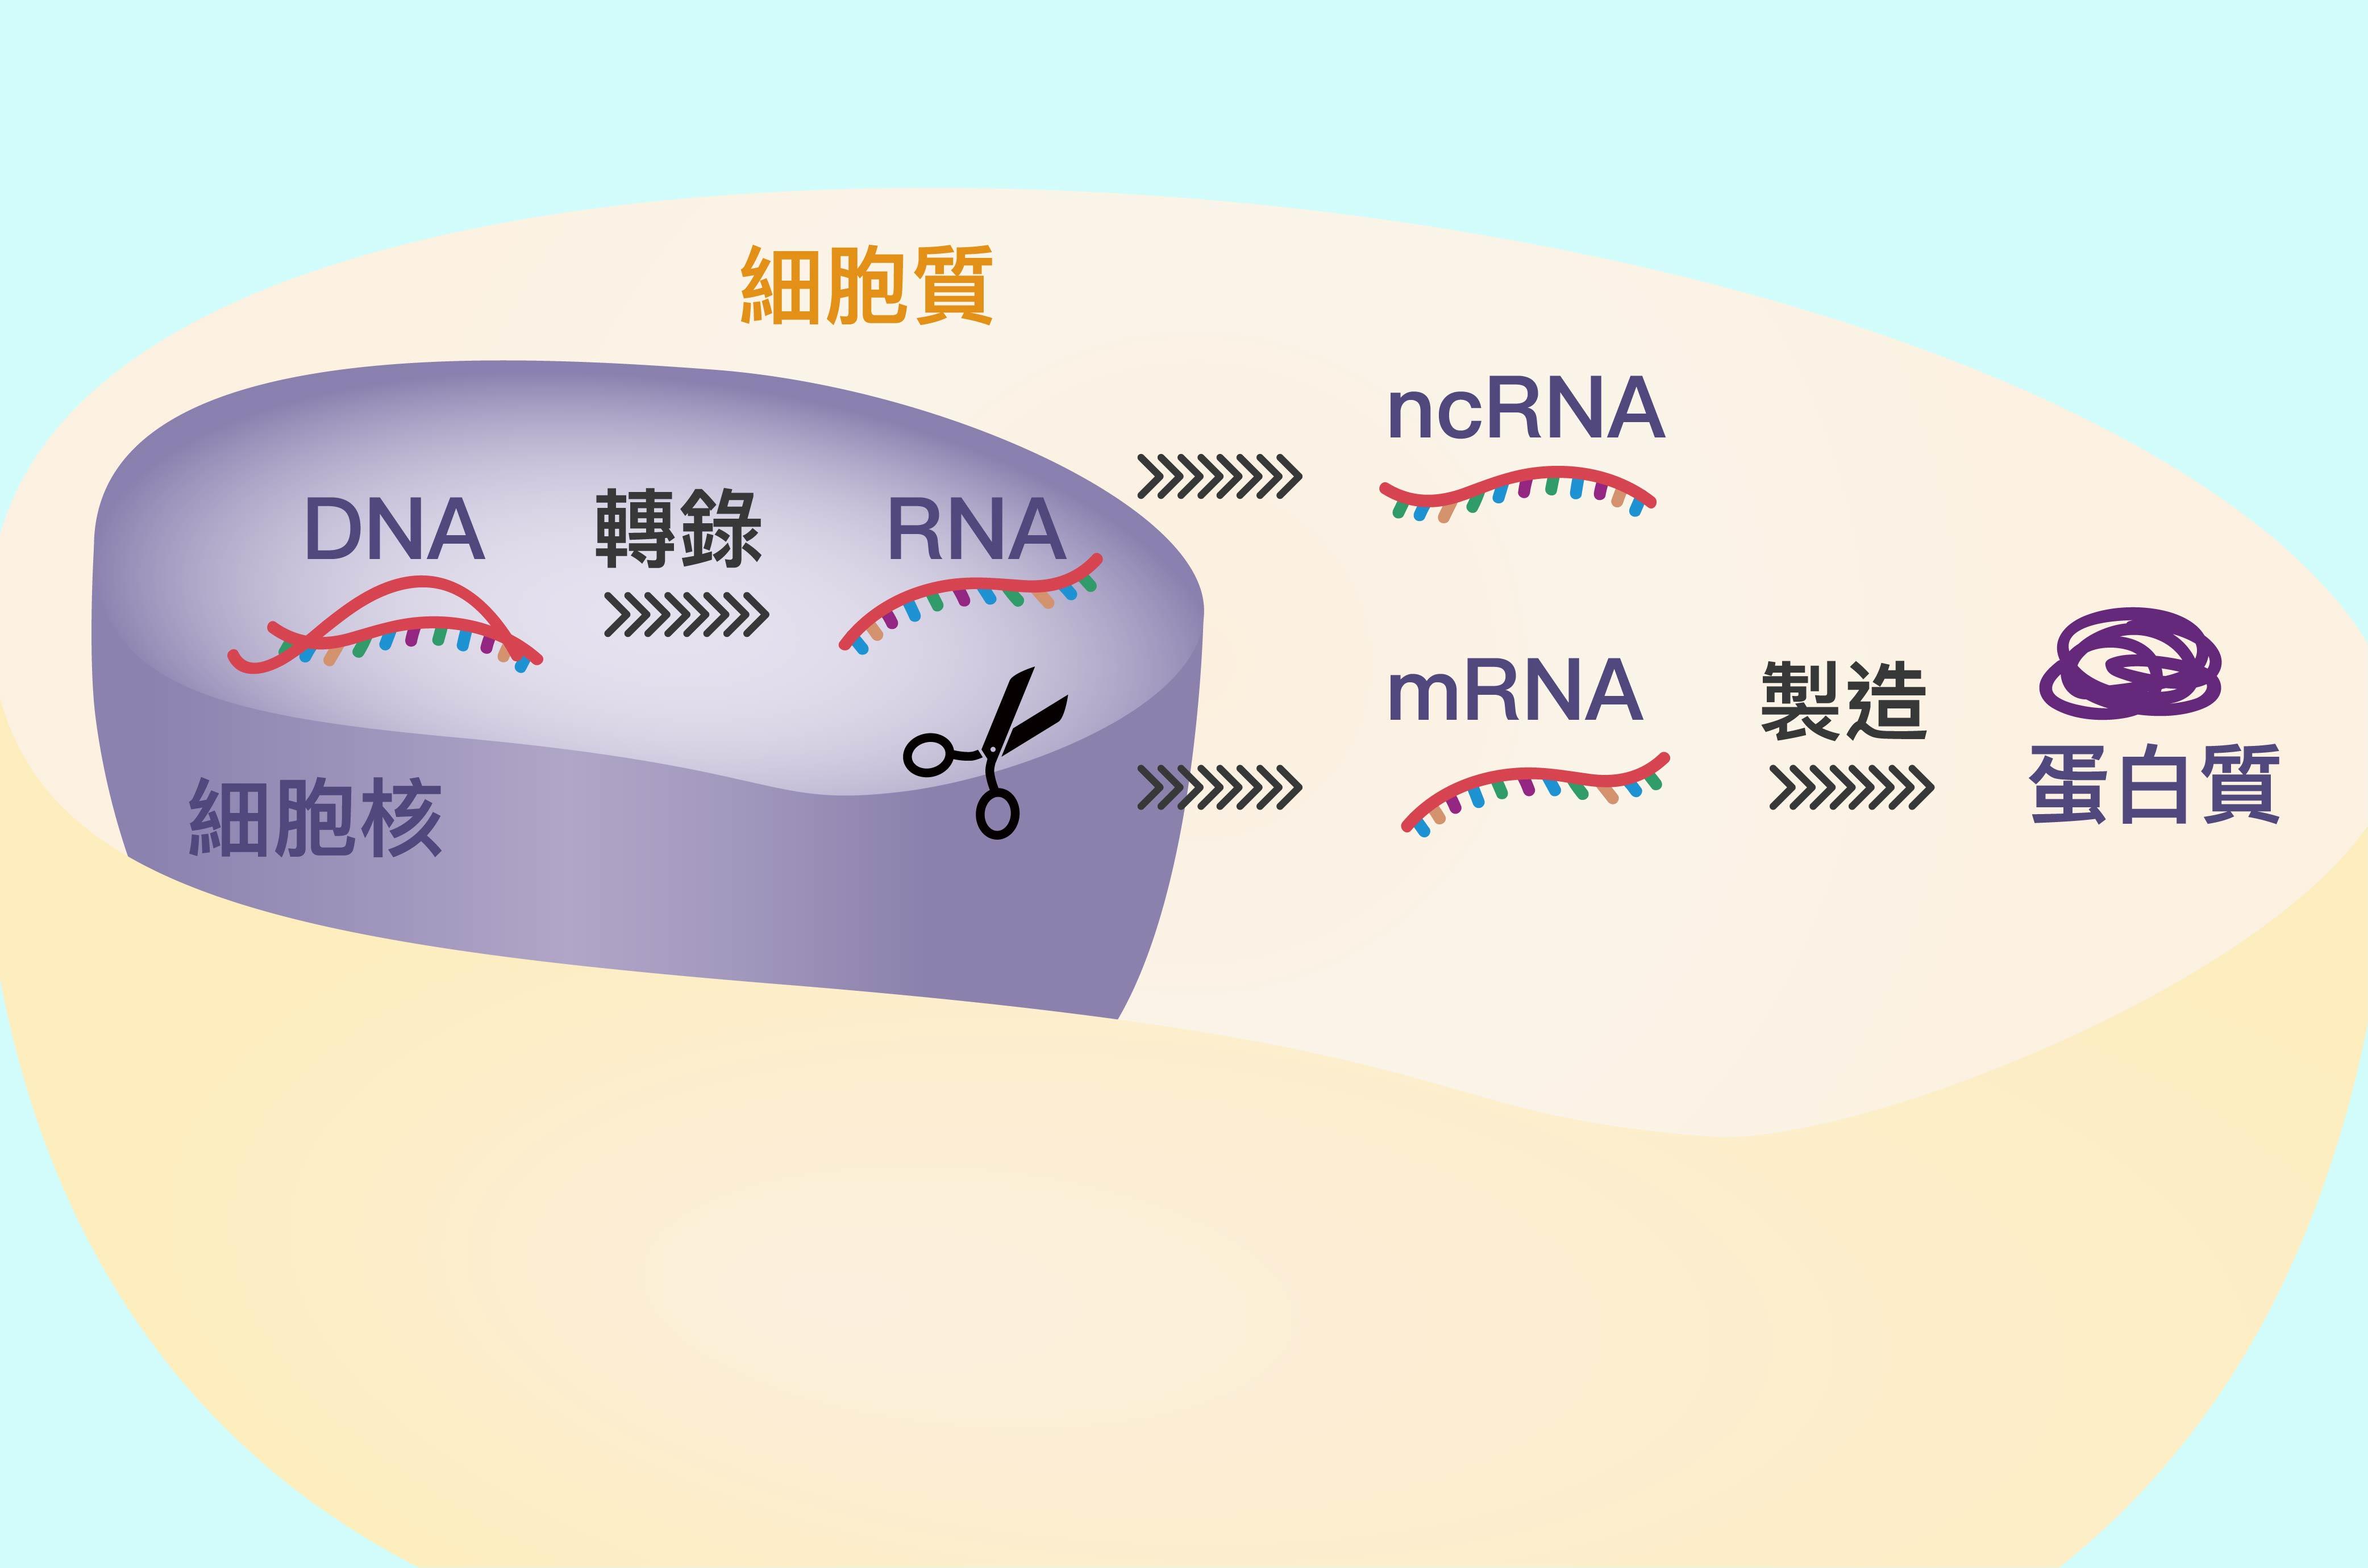 DNA 會先轉錄成 RNA ,再剪接加工為成熟 mRNA,並送去細胞質製造蛋白質 (圖中剪刀為 RNA 剪接的示意位置)。圖│研之有物